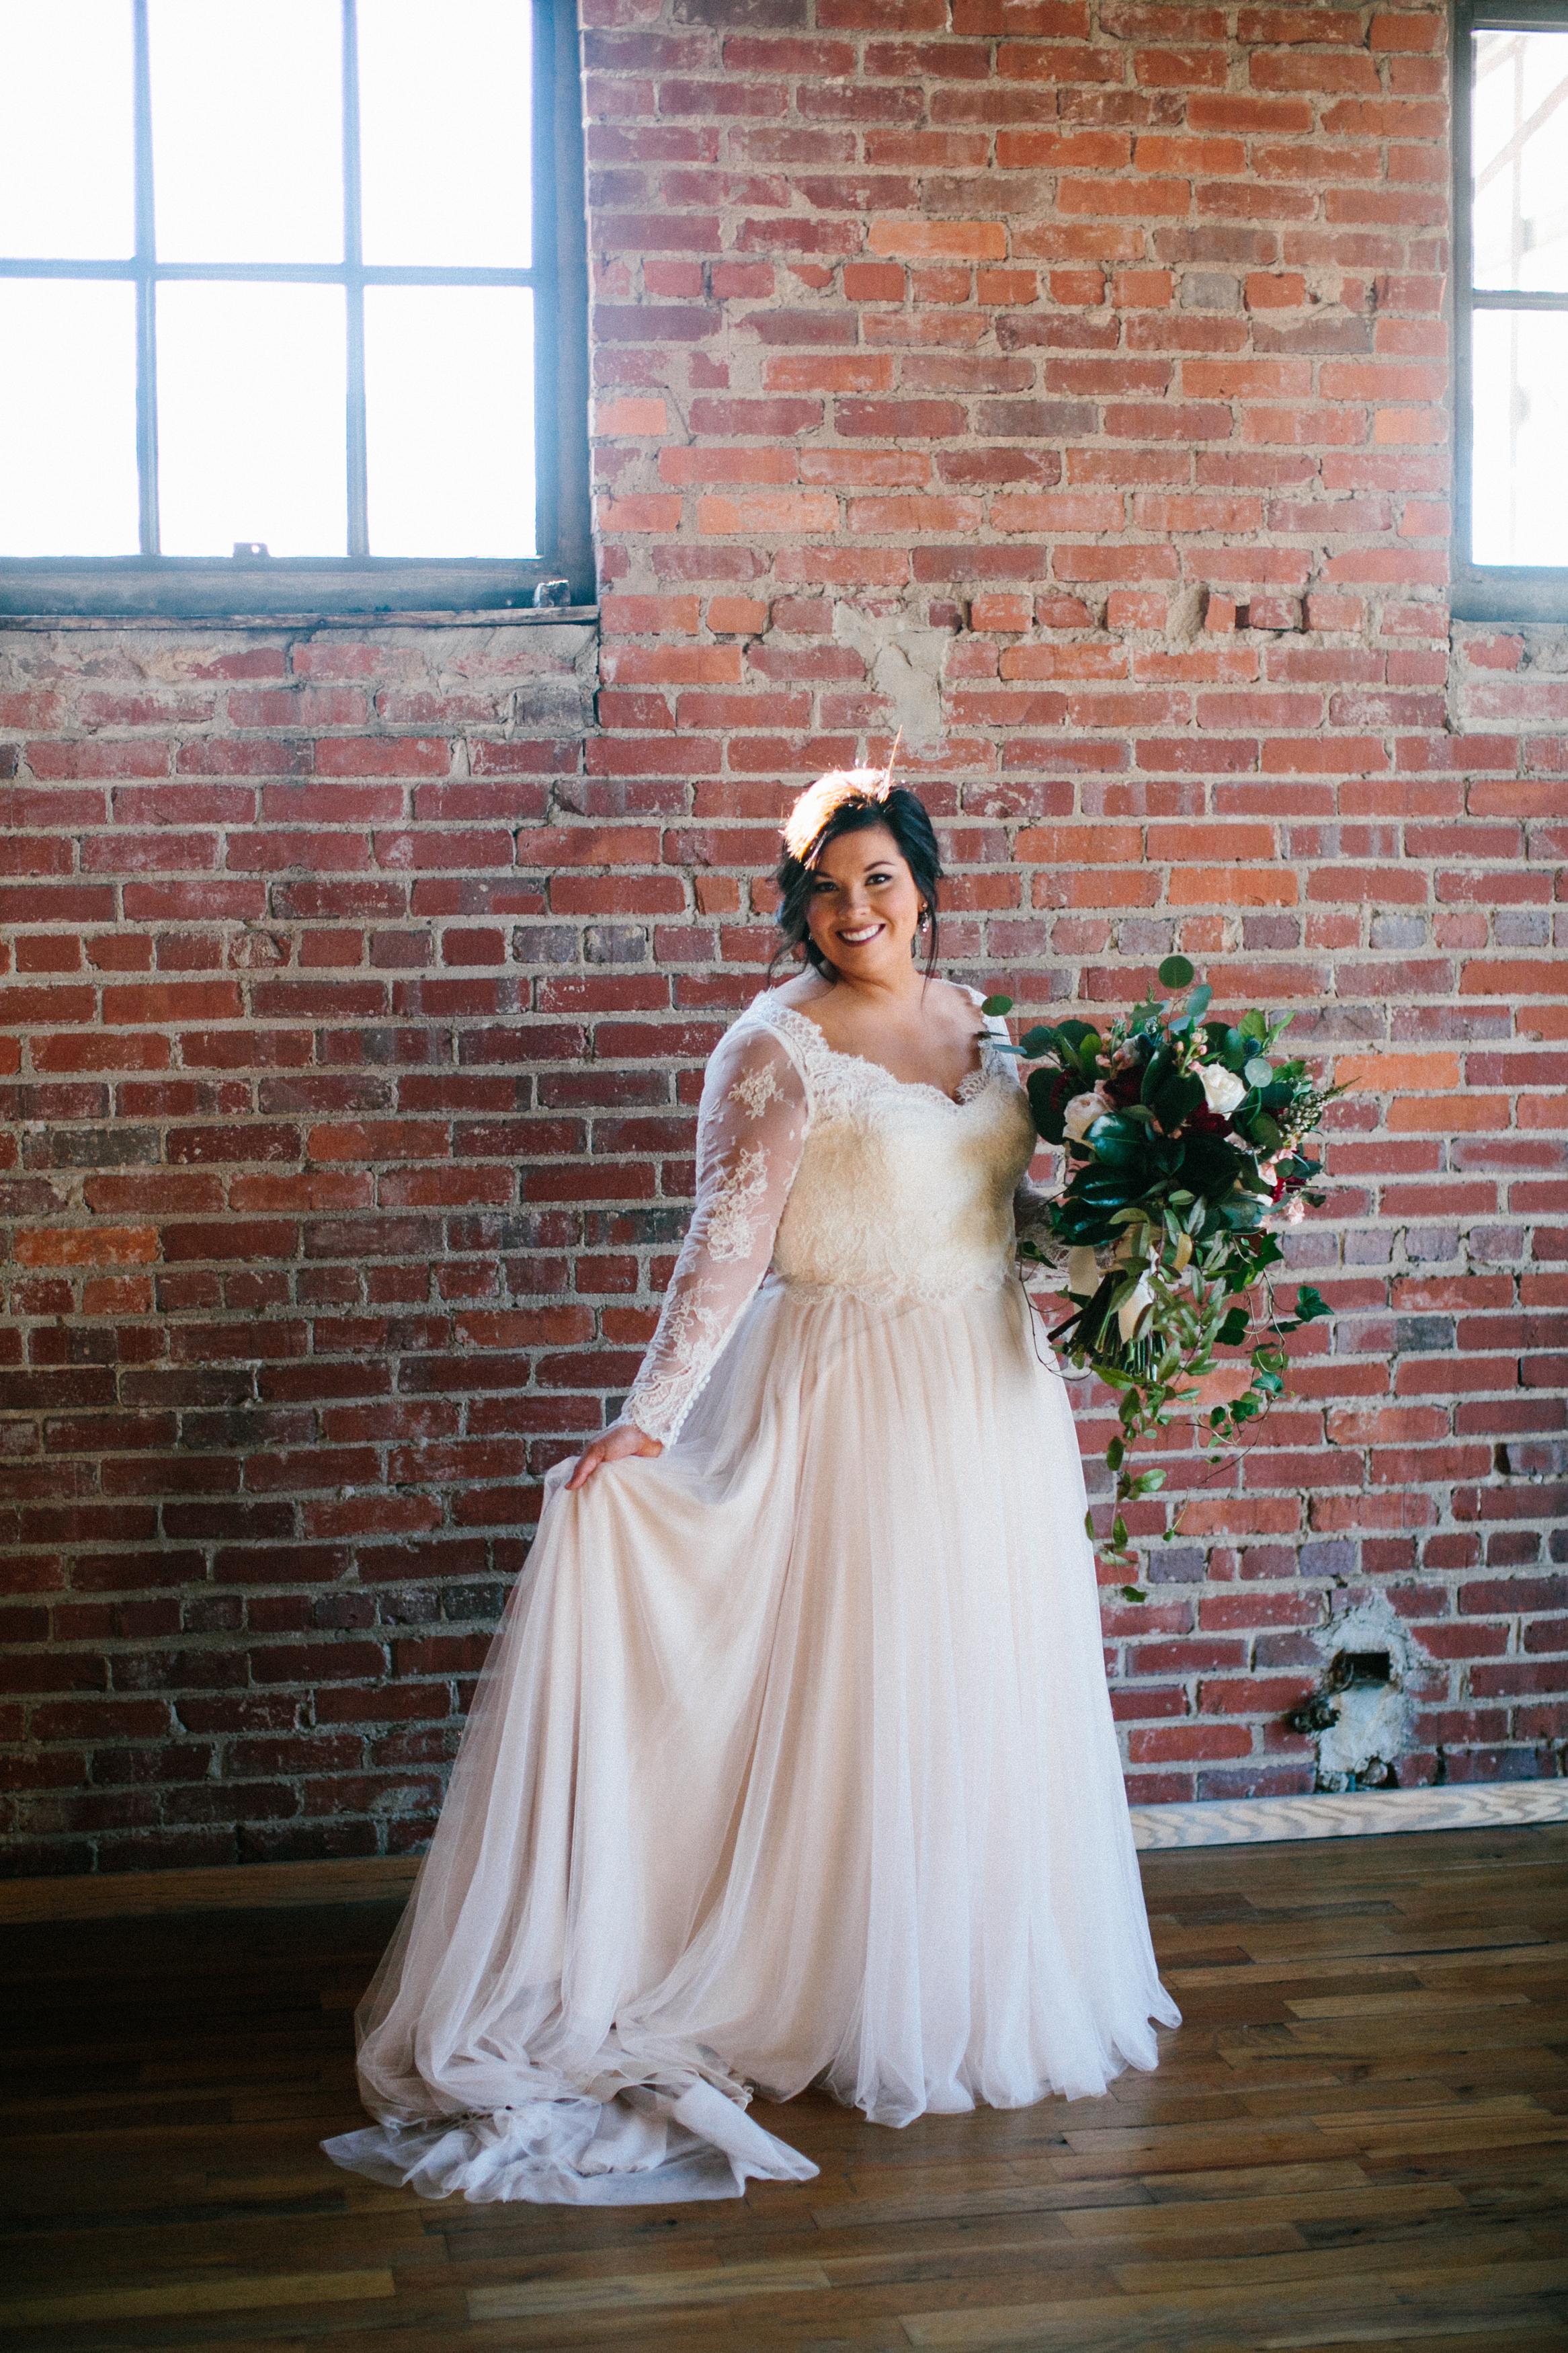 Lauren_Jeremy_Standard_Wedding_Knoxville_Abigail_Malone_Photography_FIlm-132.jpg